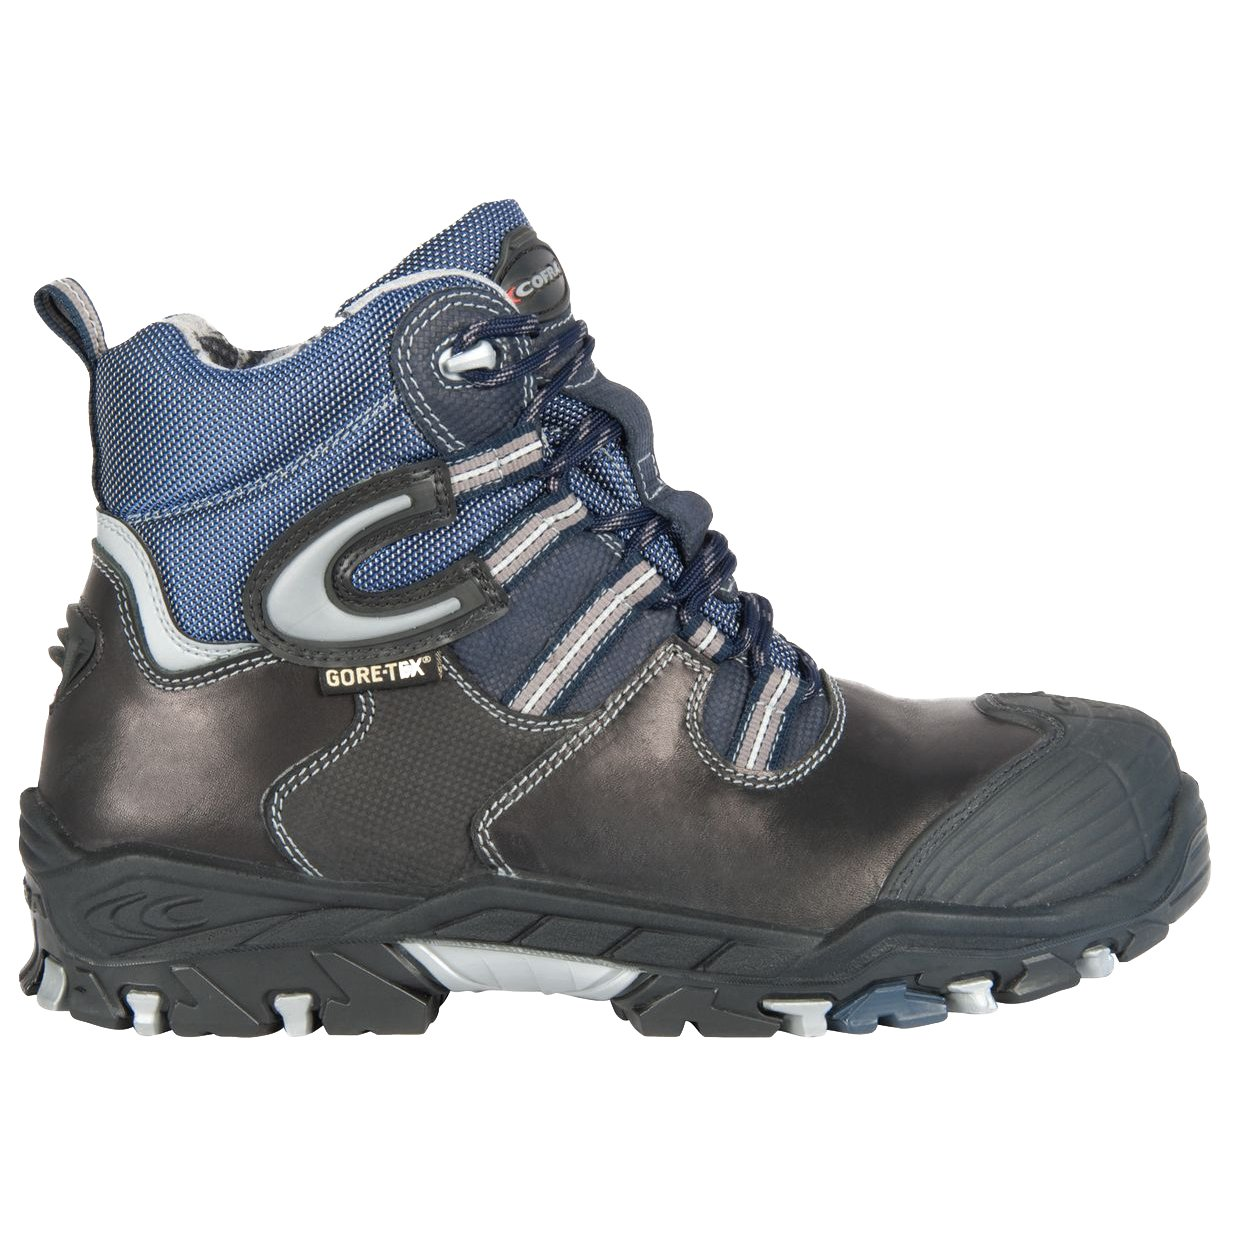 Cofra tutankamon S3 WR SRC  ndash; ndash; ndash; zapatos de seguridad talla 41 NEGRO a639f4